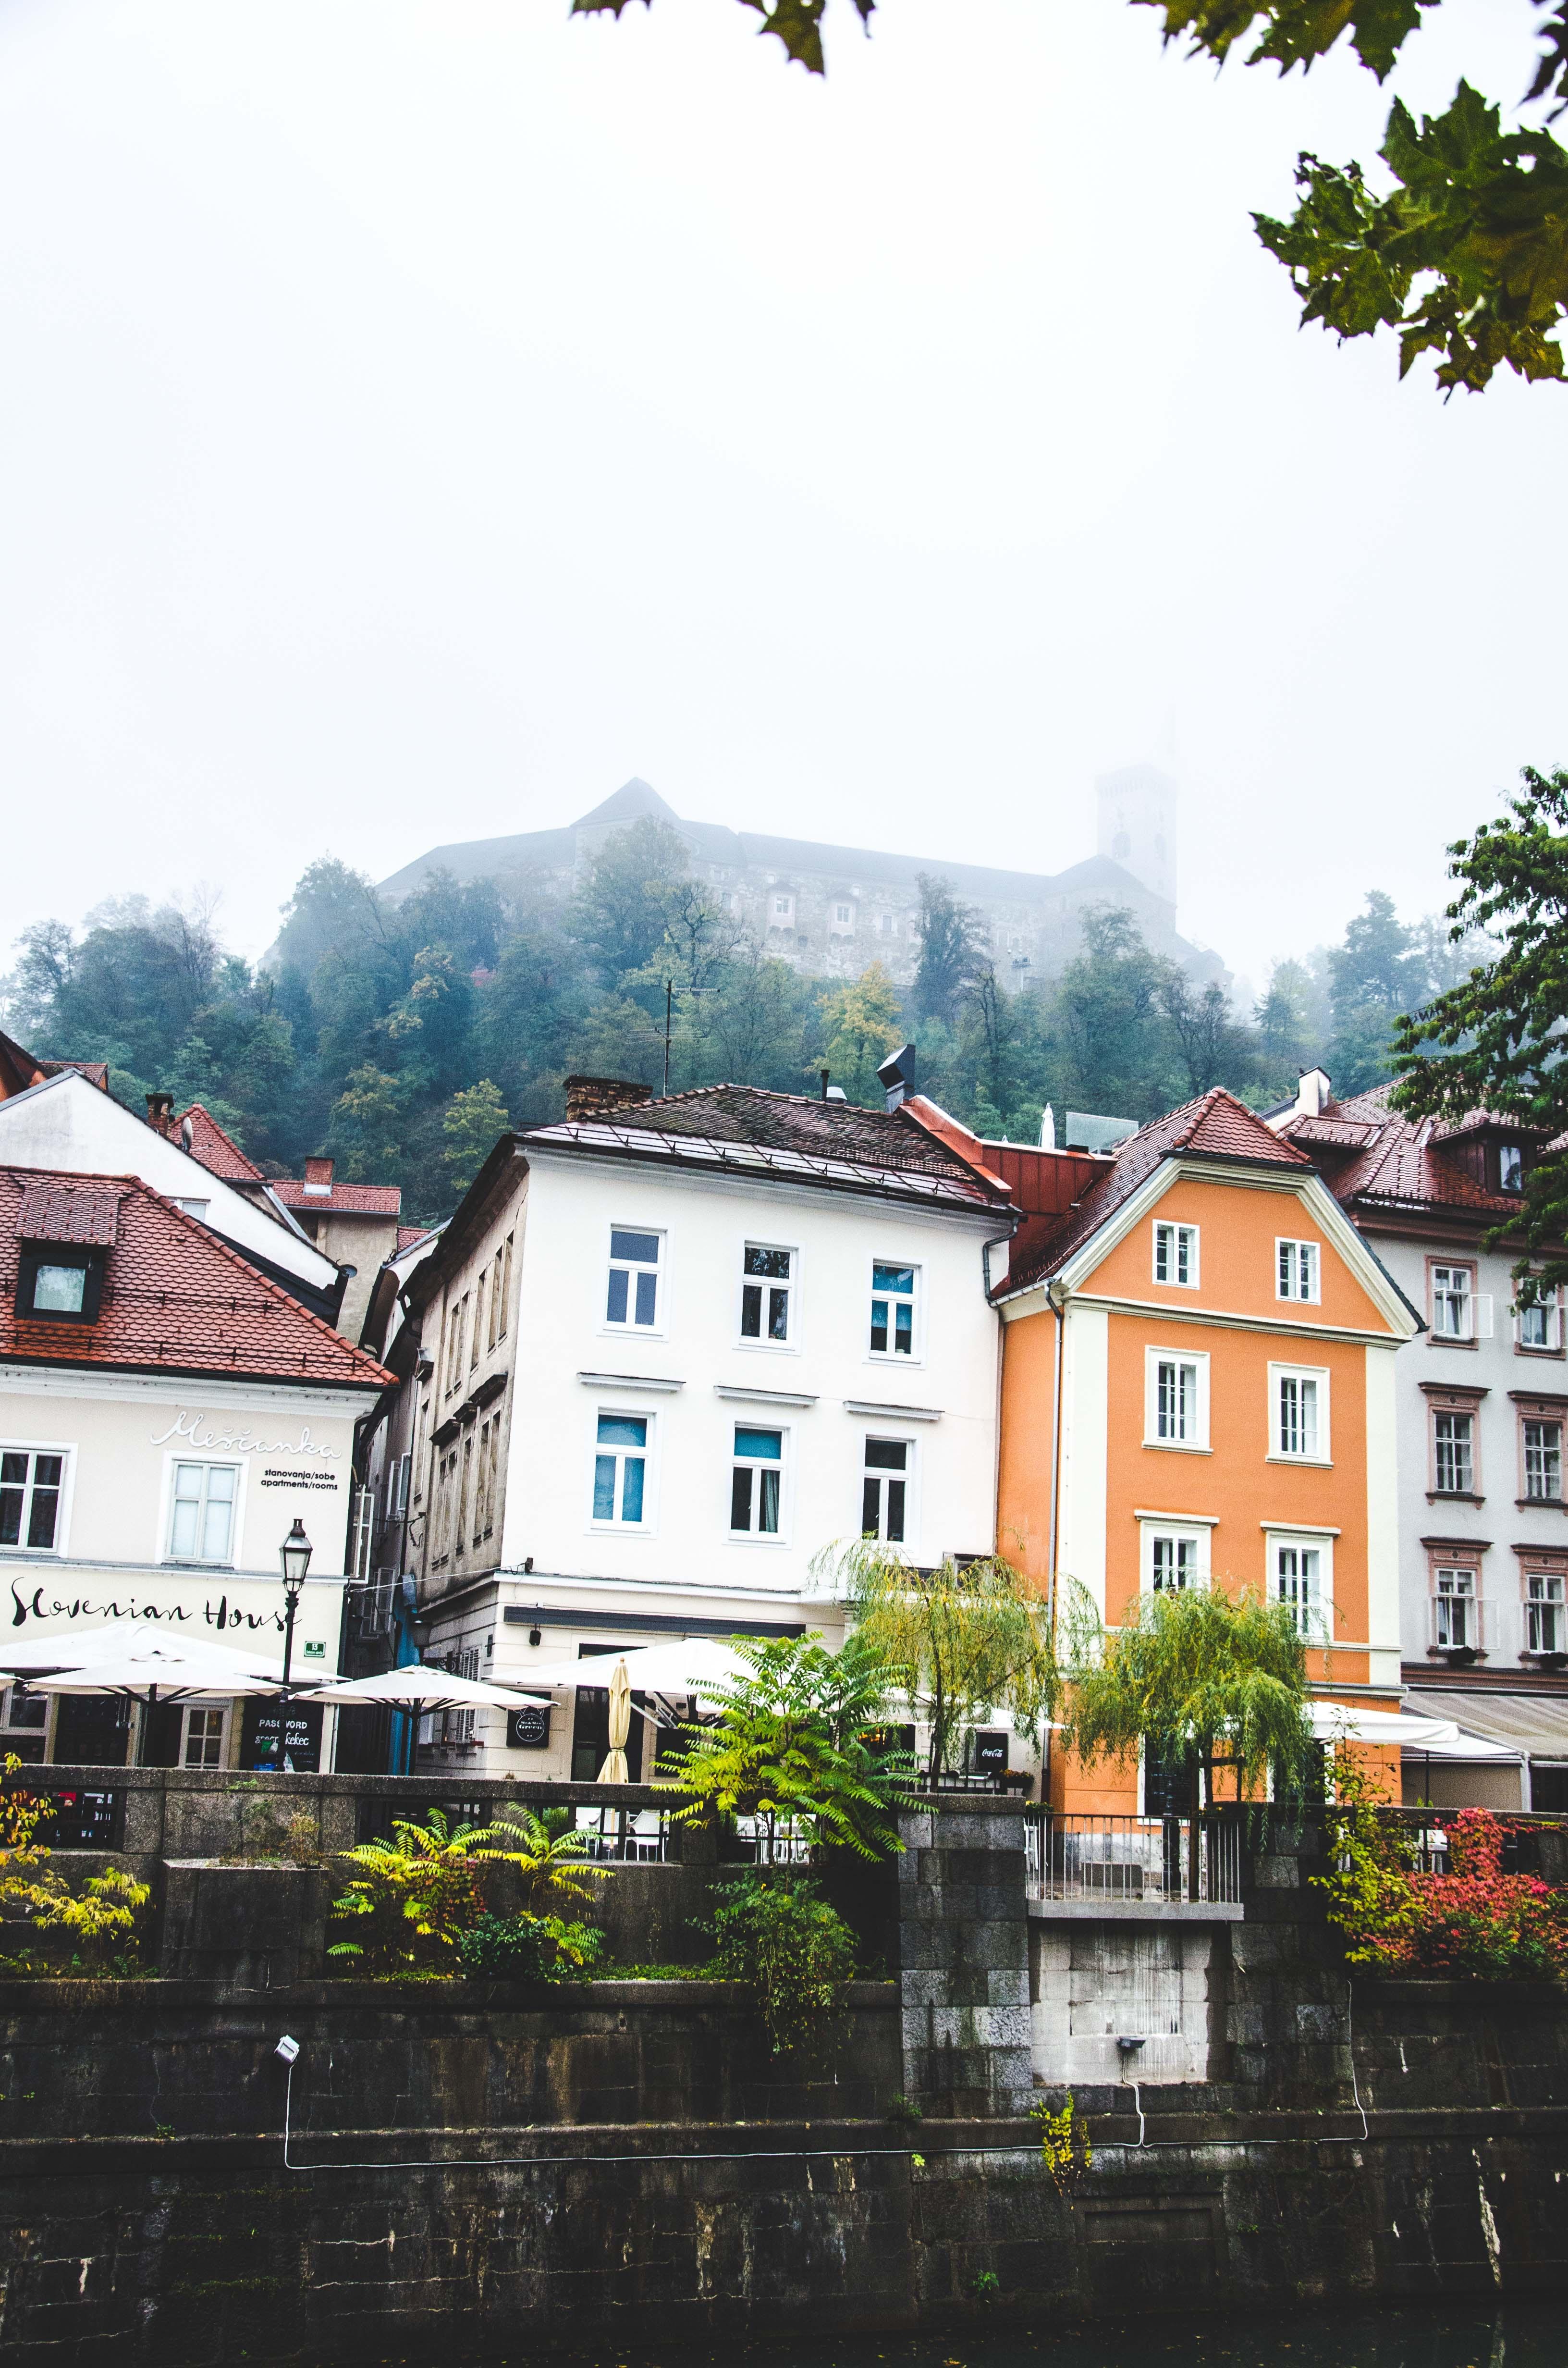 white concrete houses during daytime